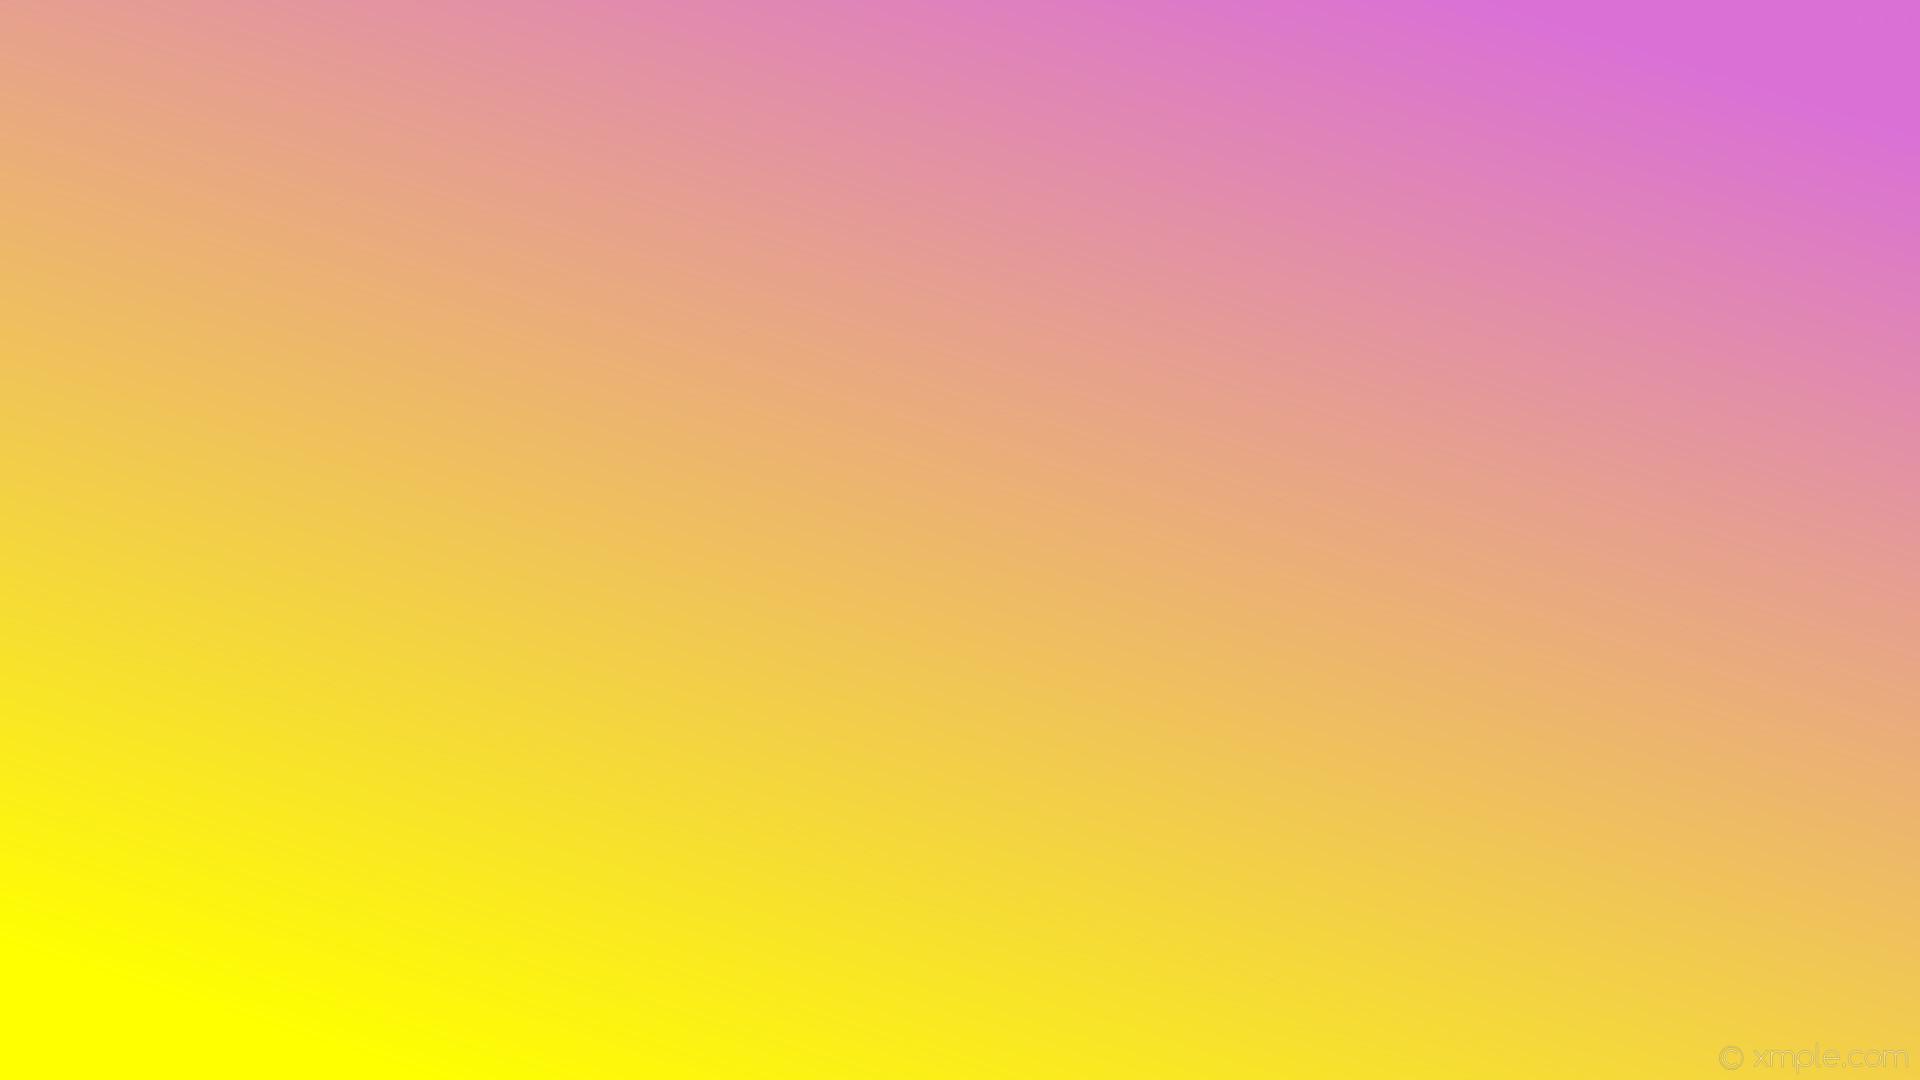 wallpaper yellow purple gradient linear orchid #ffff00 #da70d6 225°